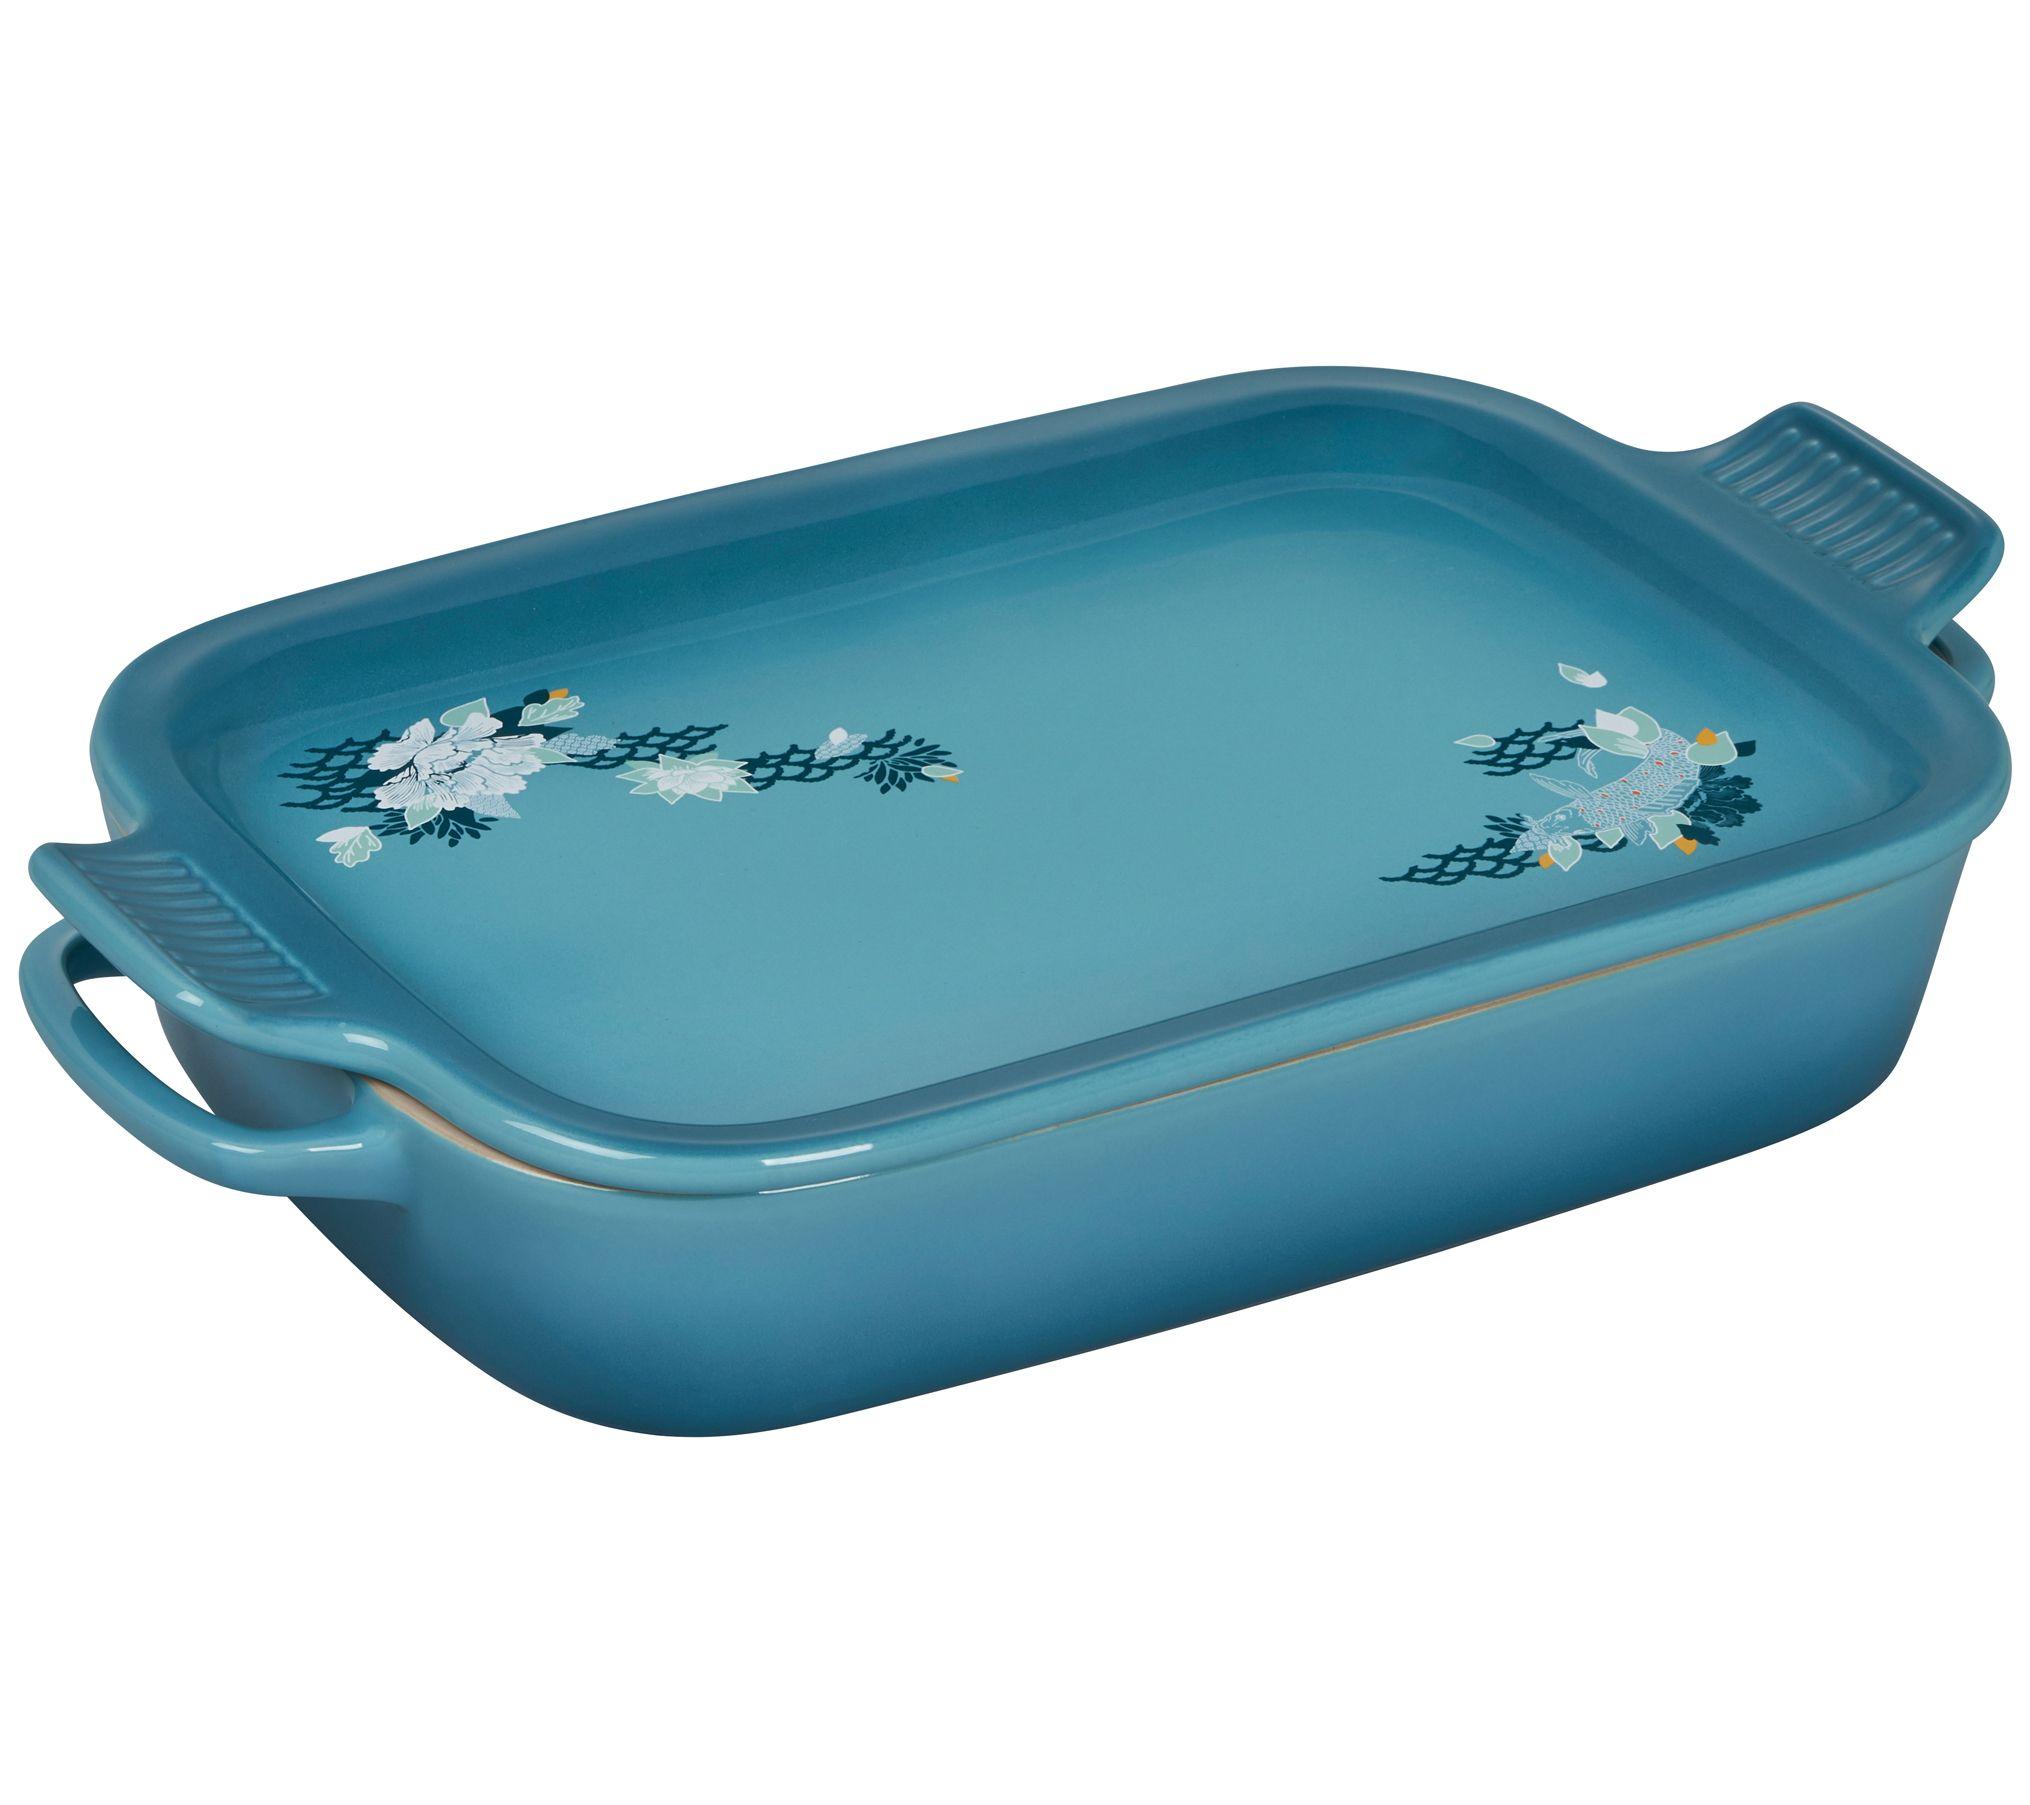 Le Creuset Lotus Rectangular Stoneware Dish with Platter Lid - QVC.com